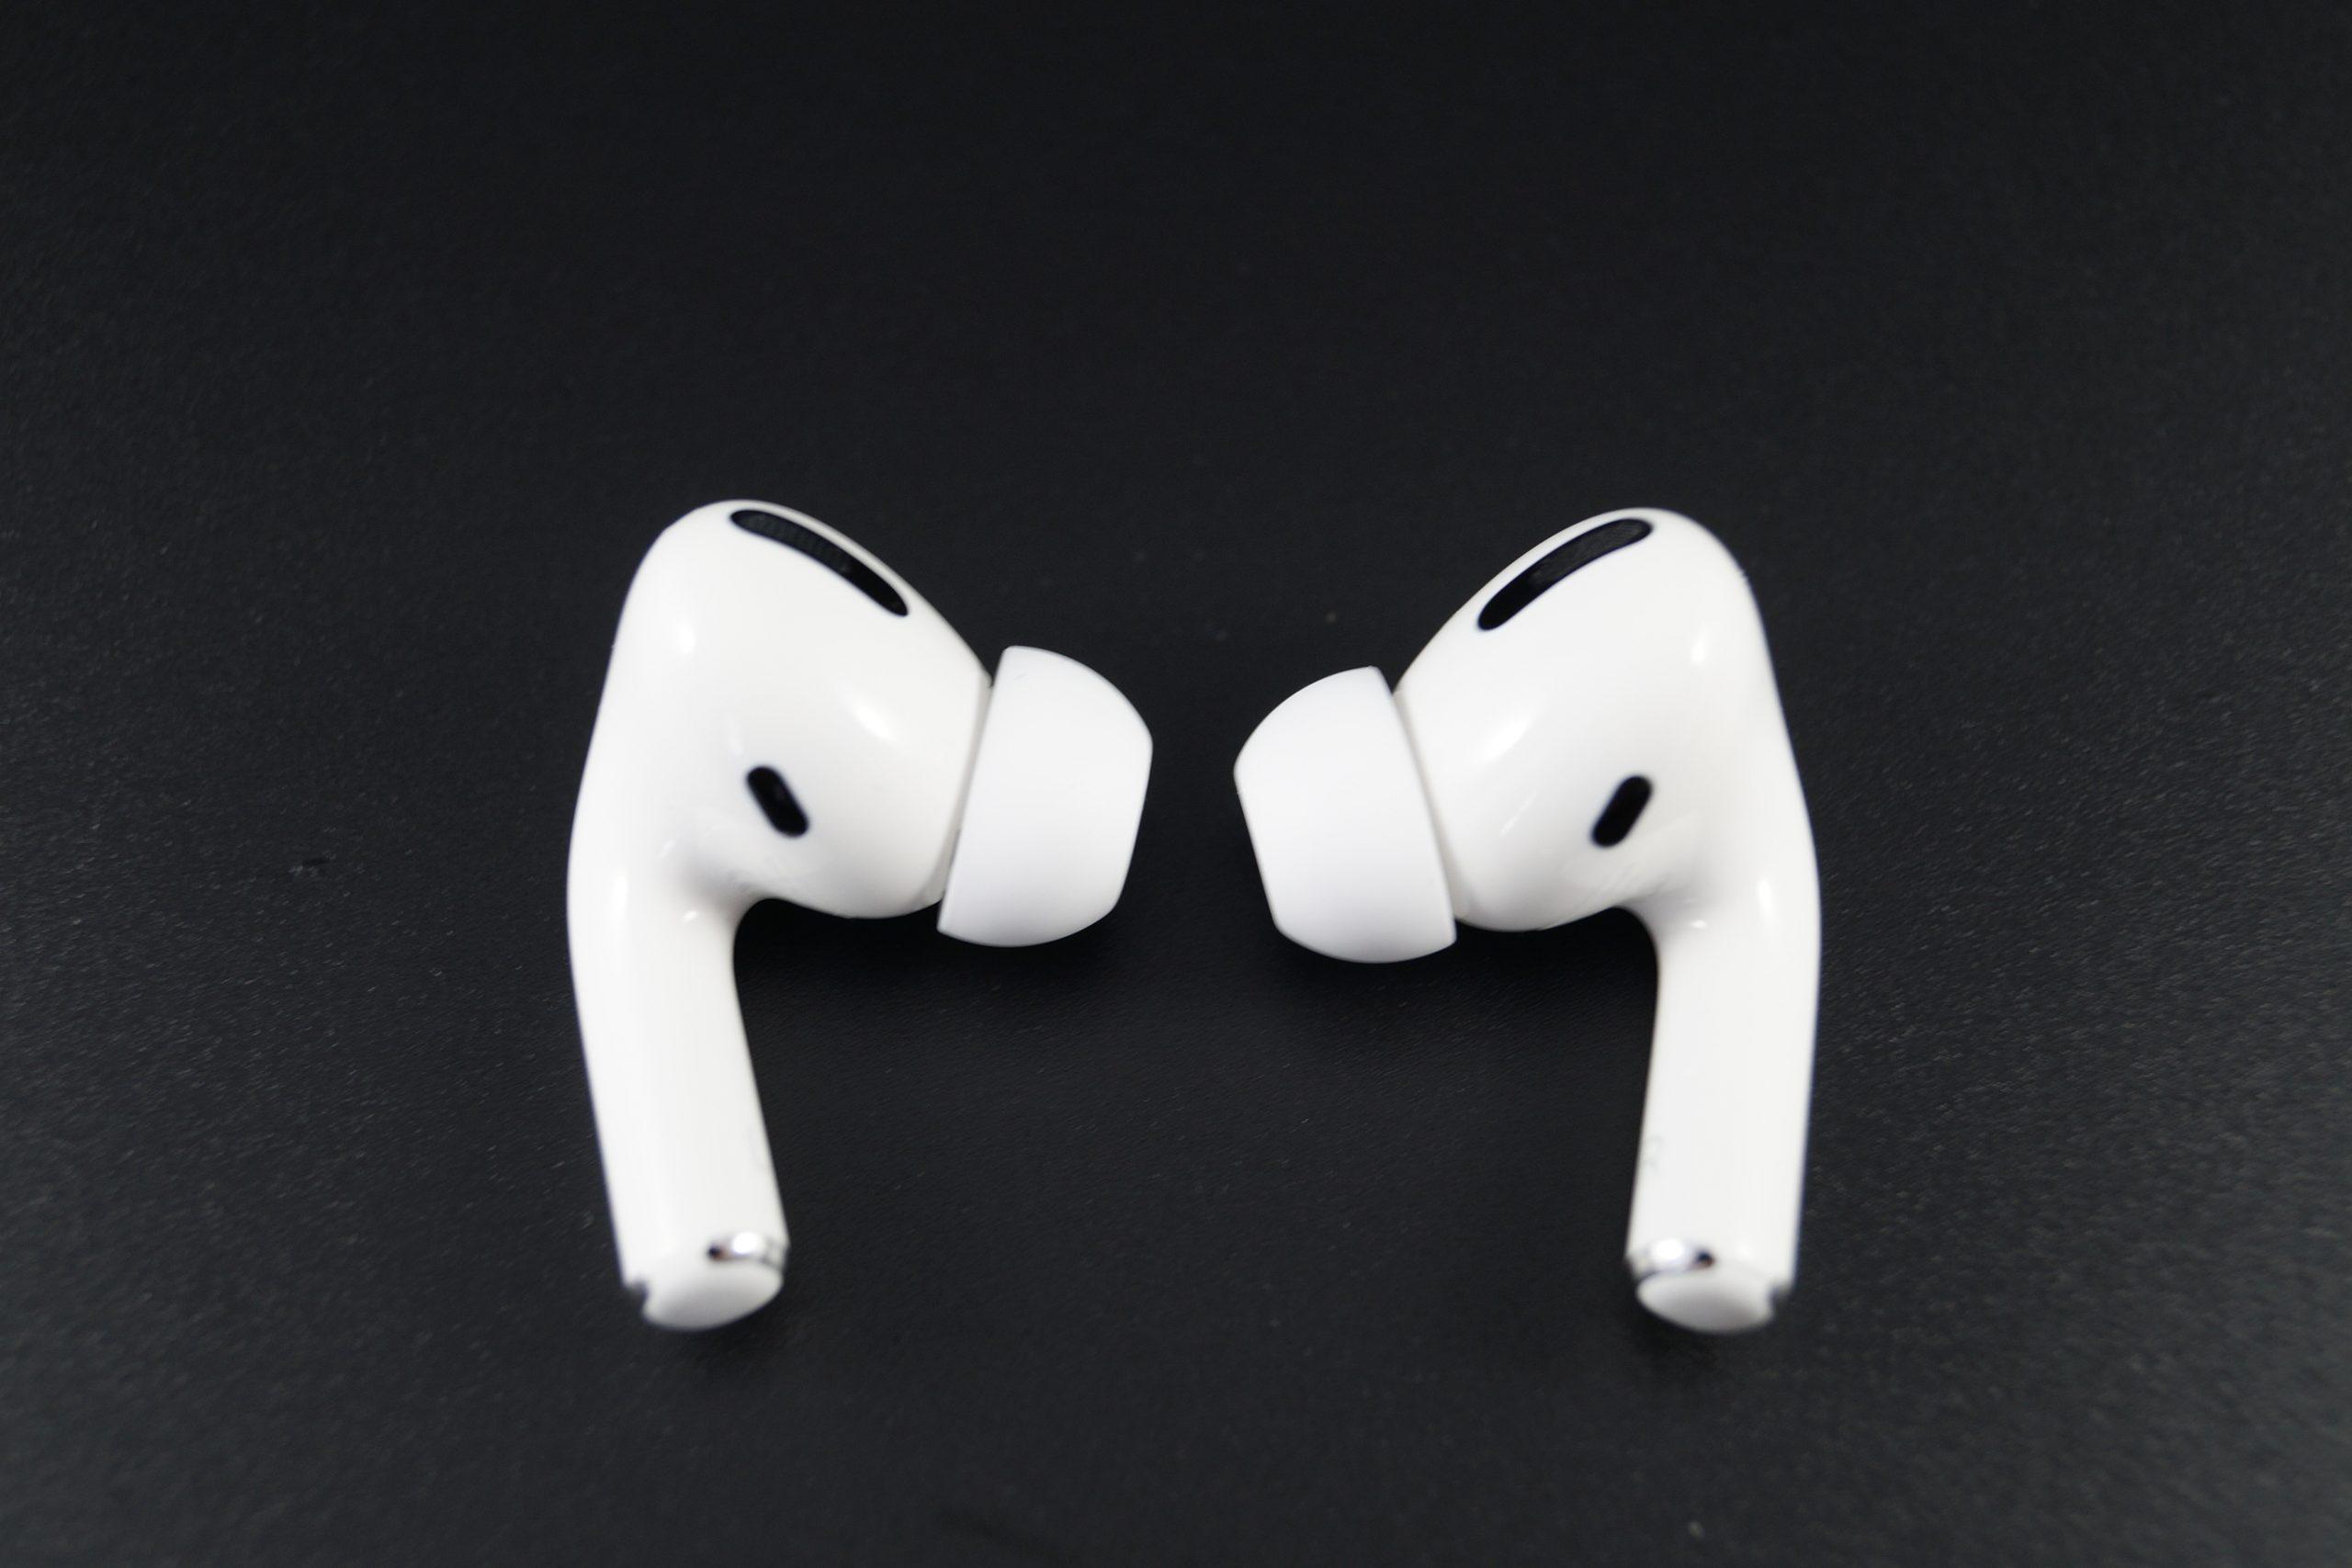 Apple AirPods Pro Kopfhörer 2